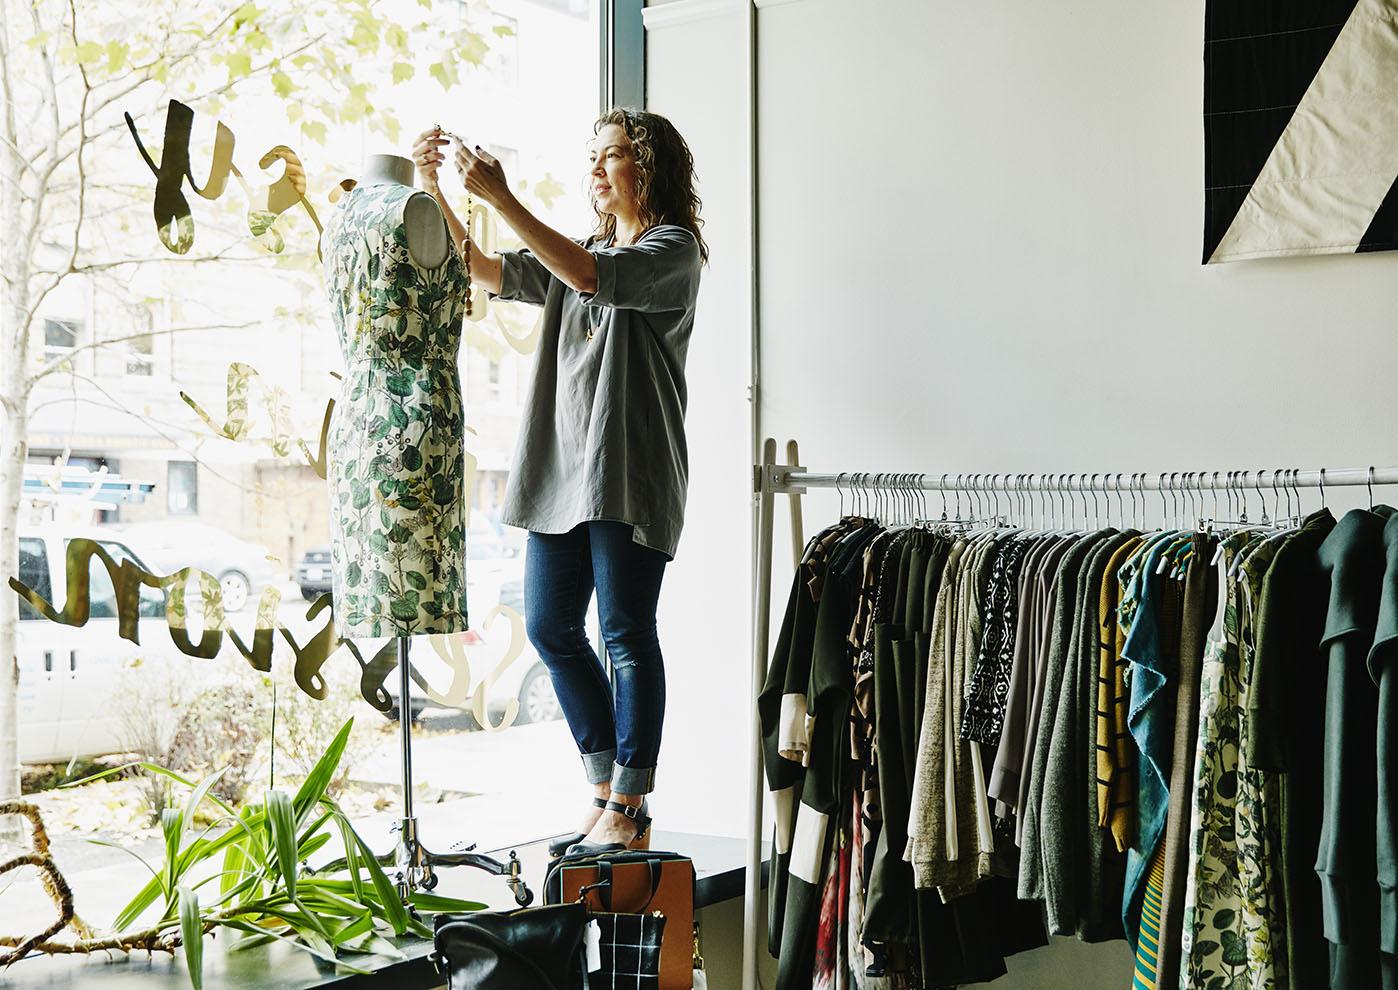 Female business owner dressing dress form